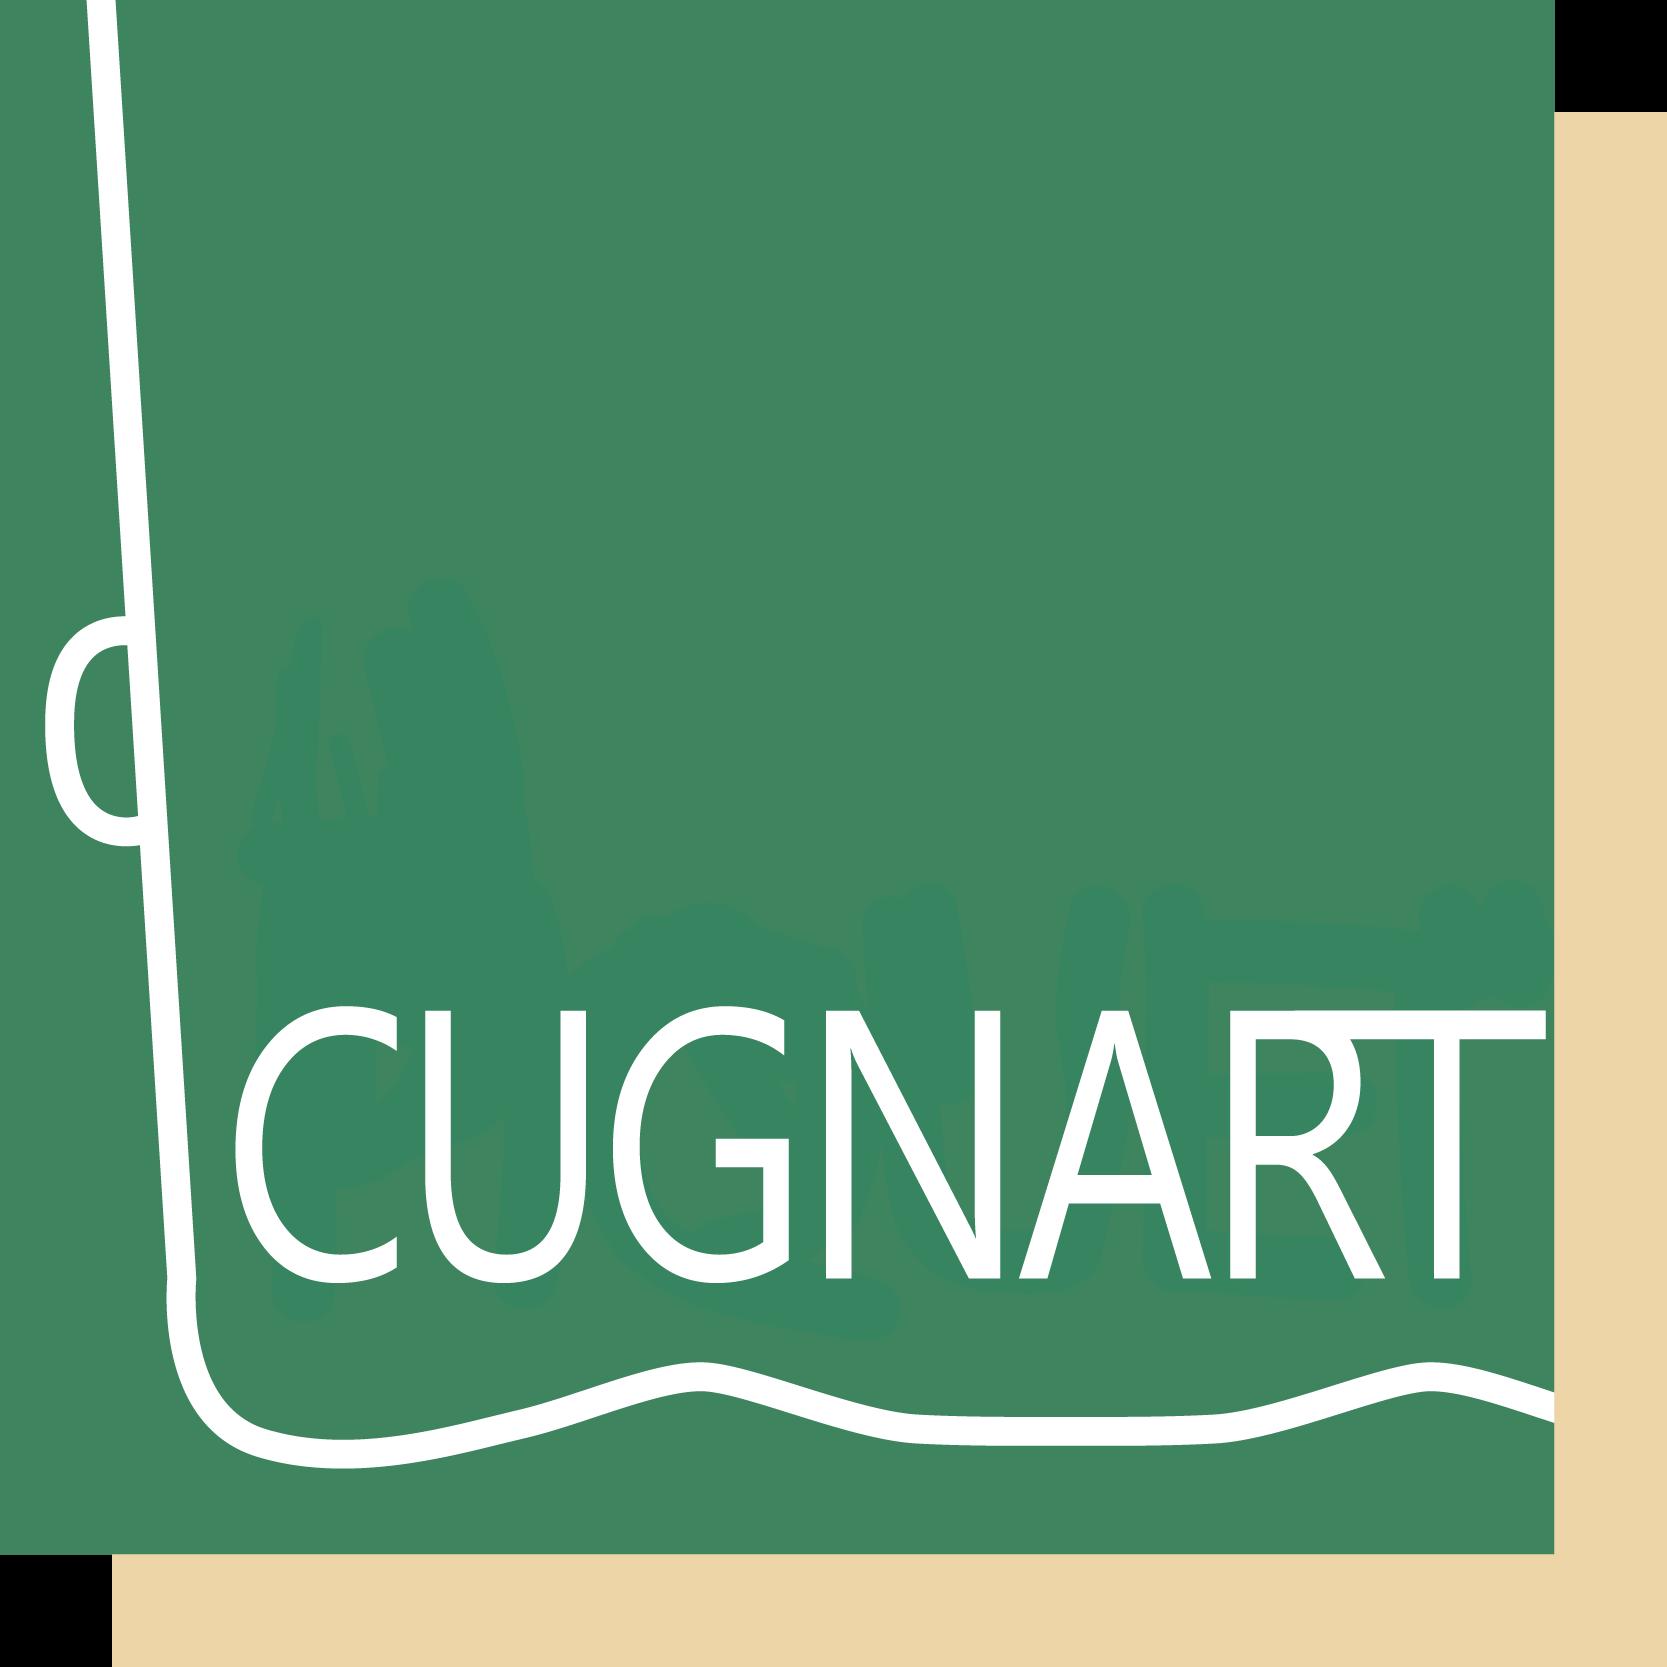 Cugnart Logo